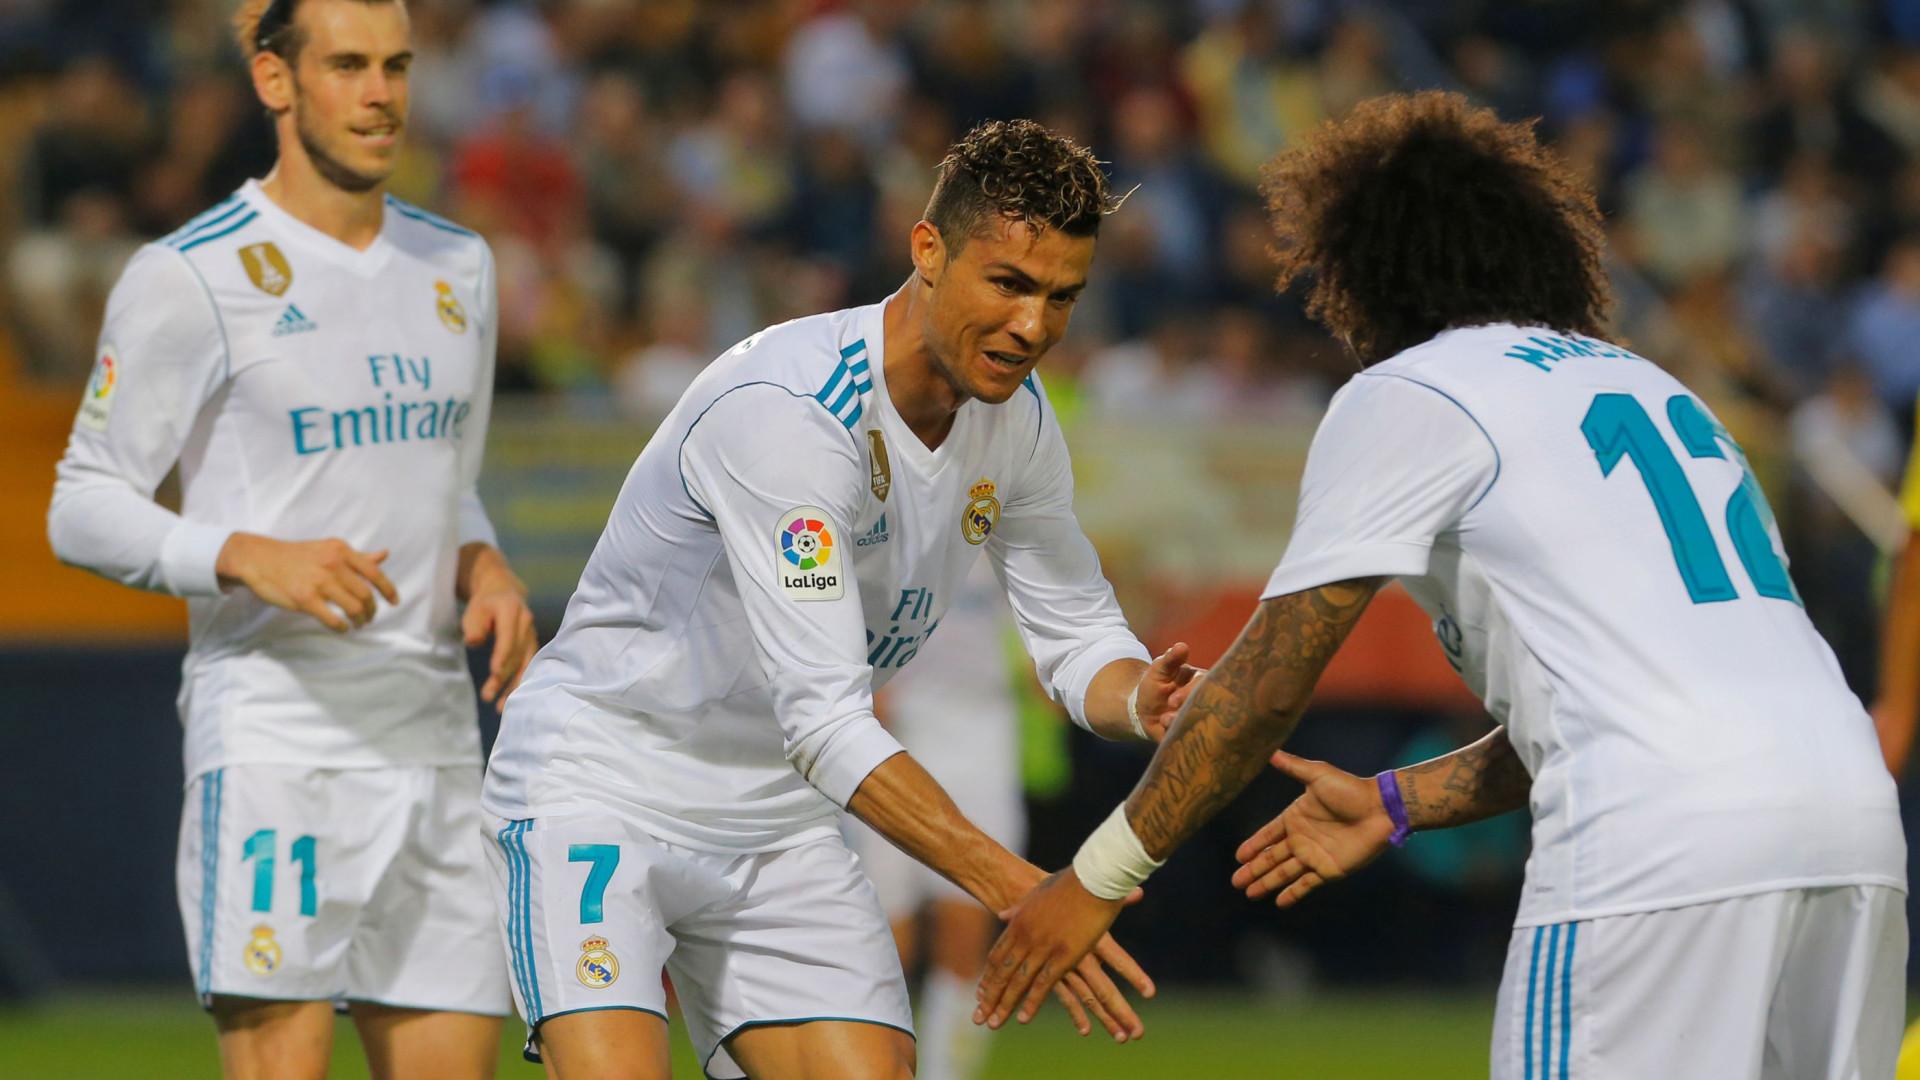 Juventus disposta a satisfazer desejo de Cristiano Ronaldo